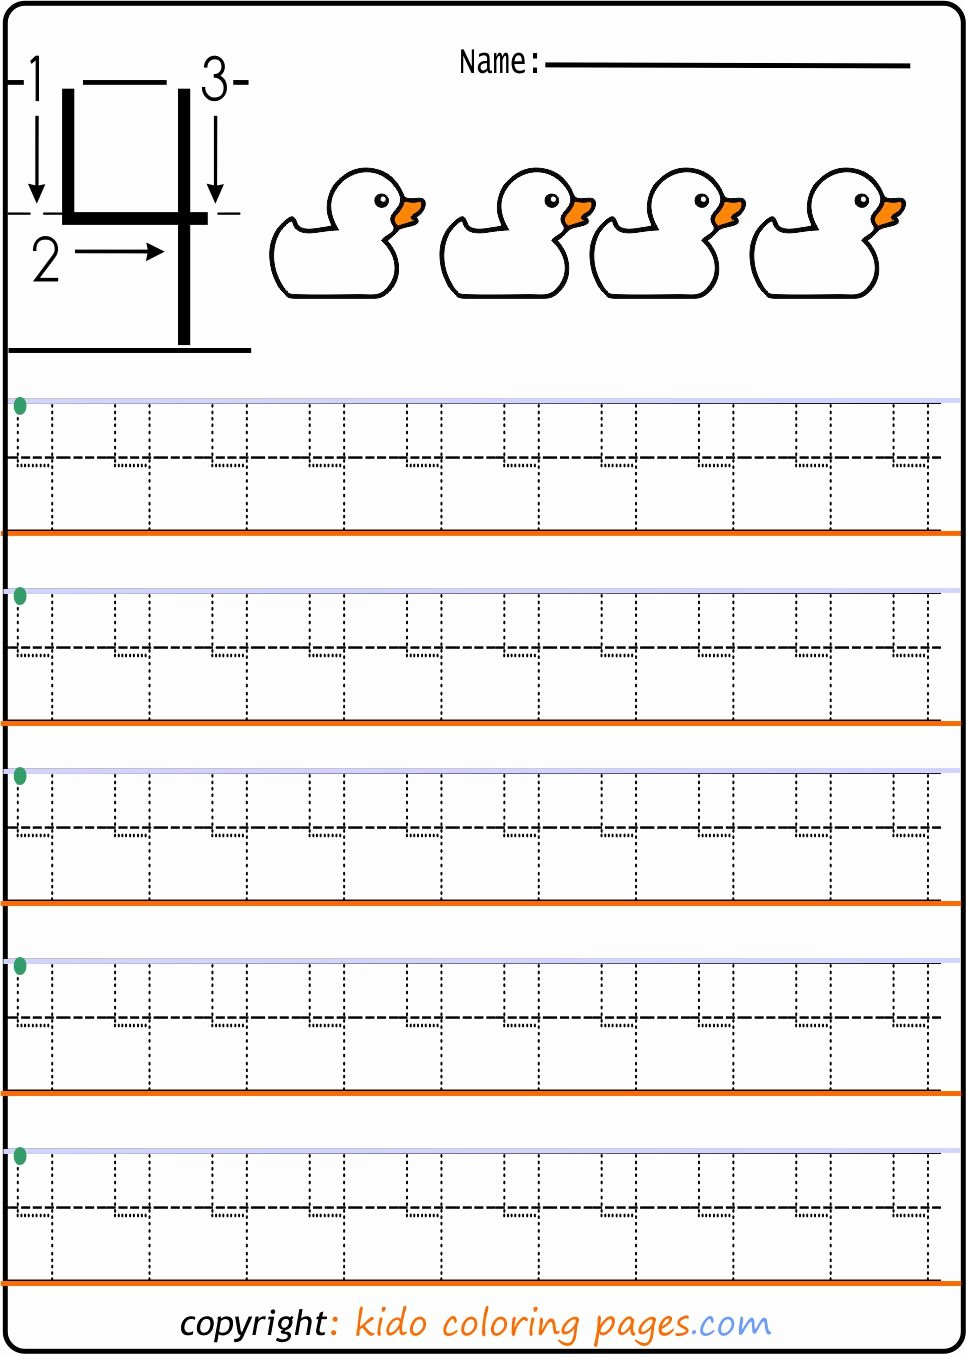 Number 4 Worksheets for Preschoolers Lovely Number Tracing Worksheets for Preschool Kids Coloring Fun